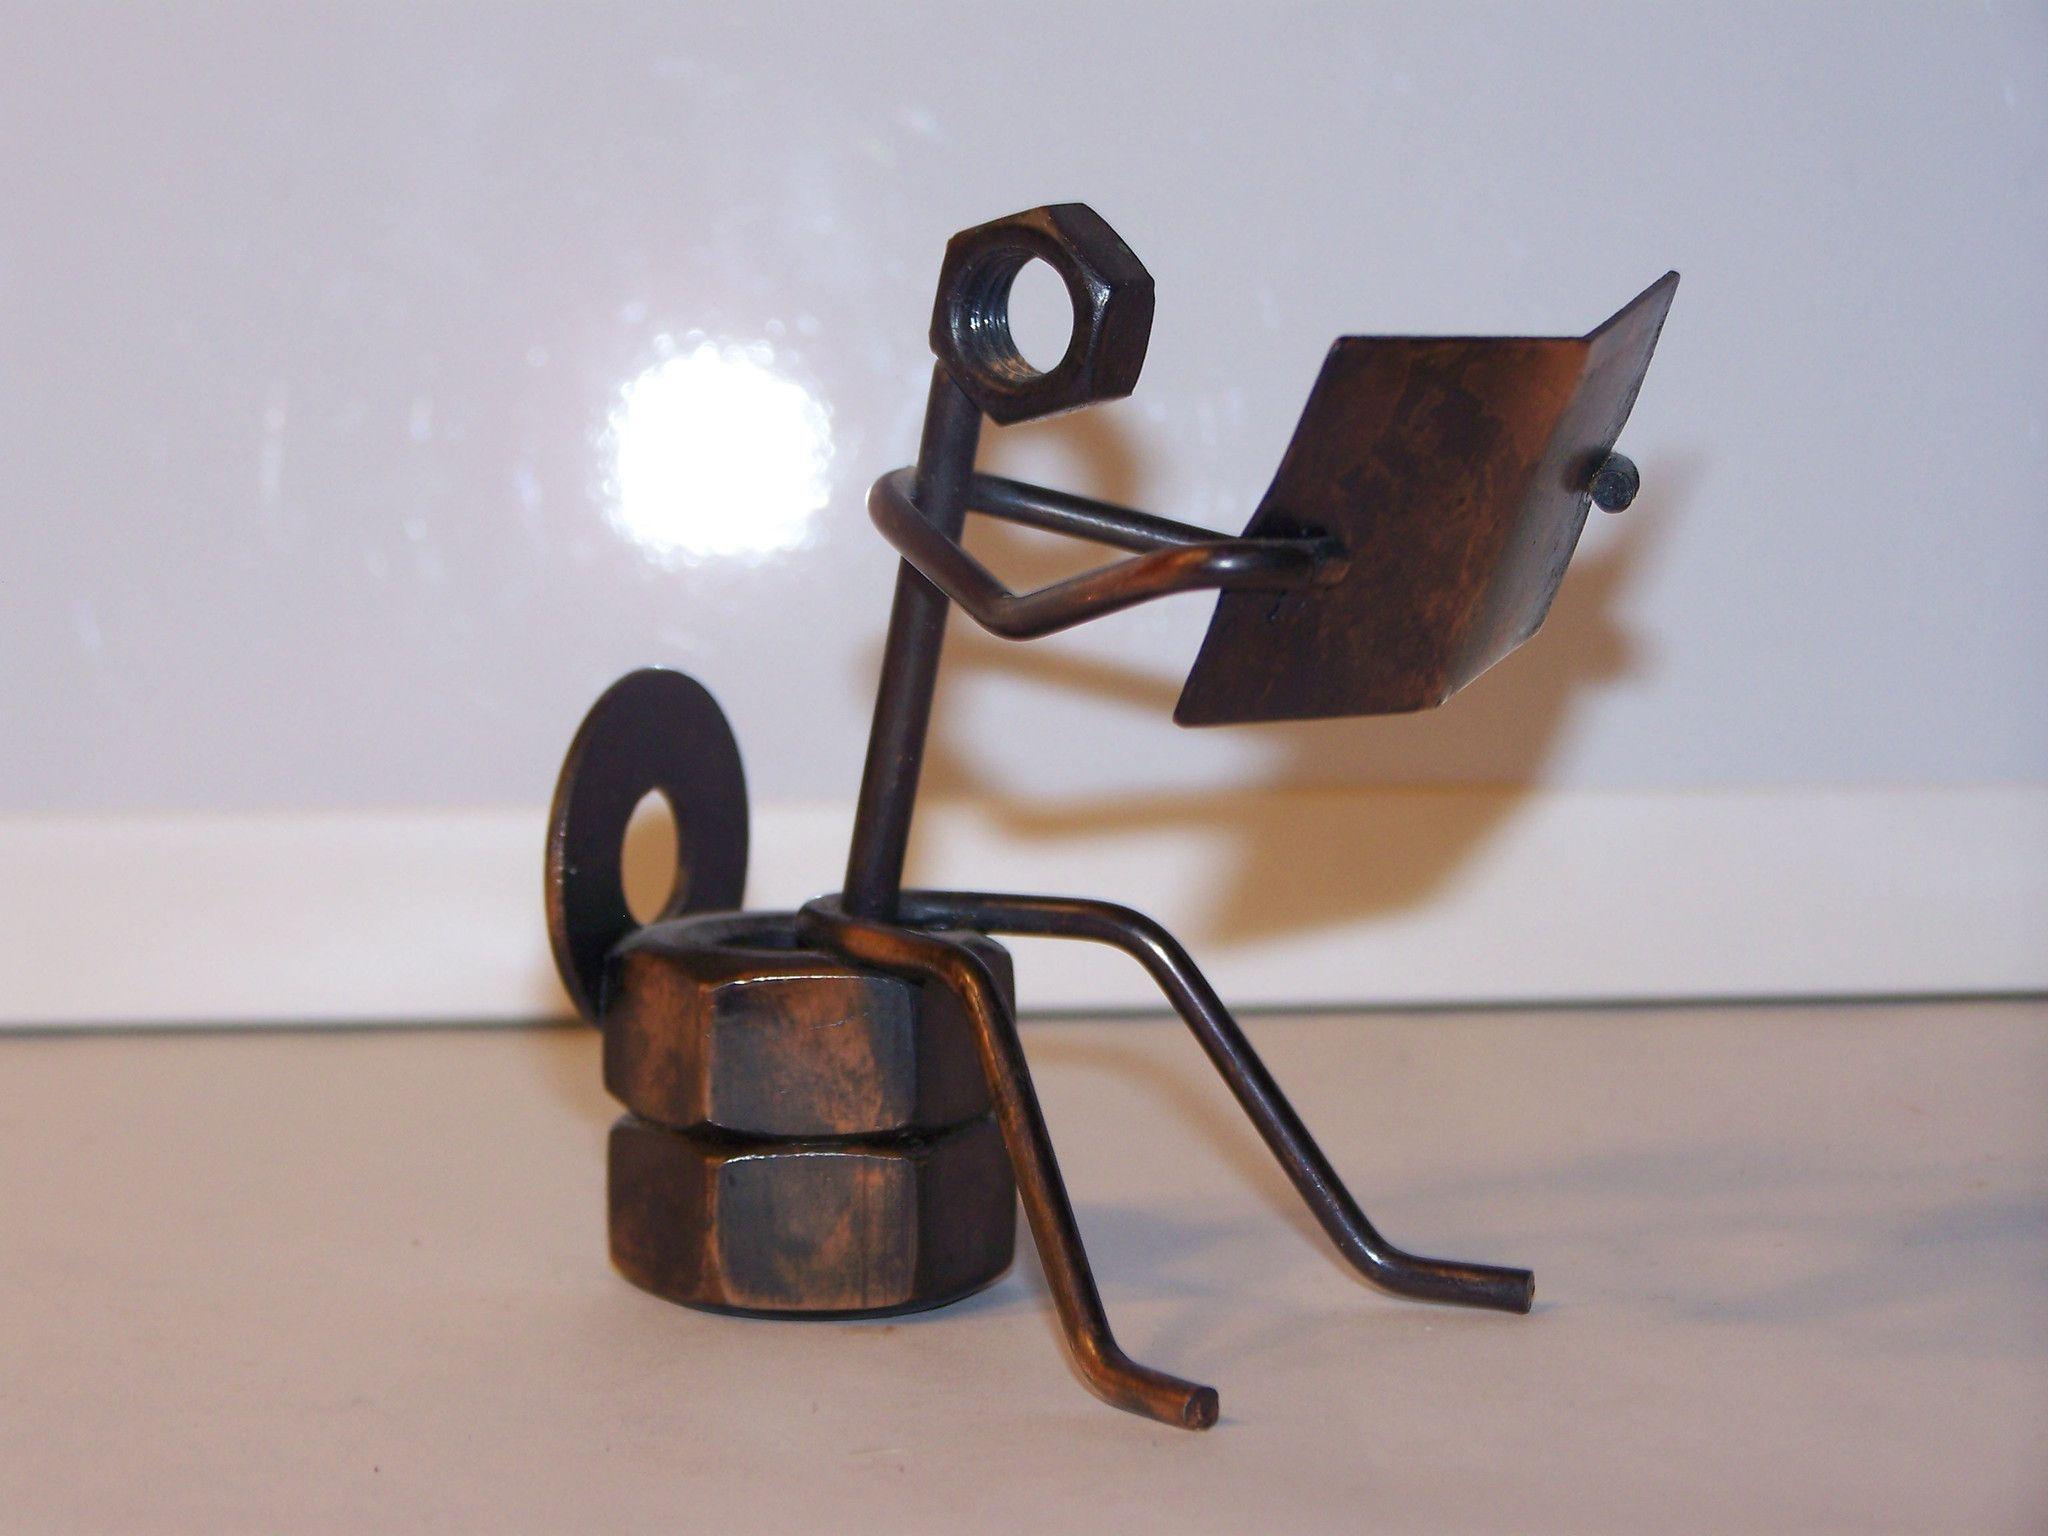 Small scrap metal toilet reader toilet scrap and metals - Simple metal art projects ...